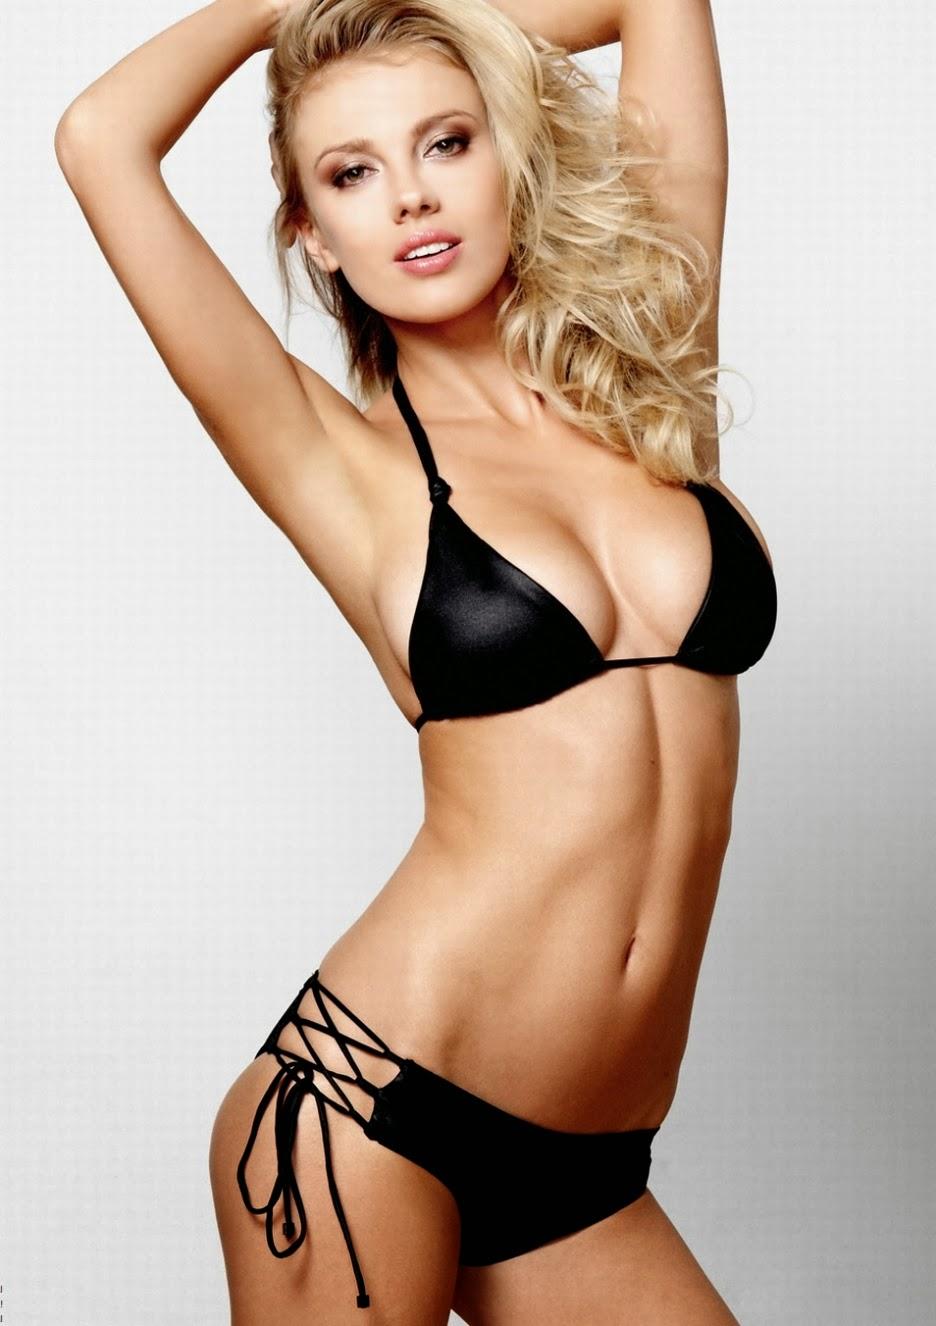 Hot Brittany Rhea nude photos 2019